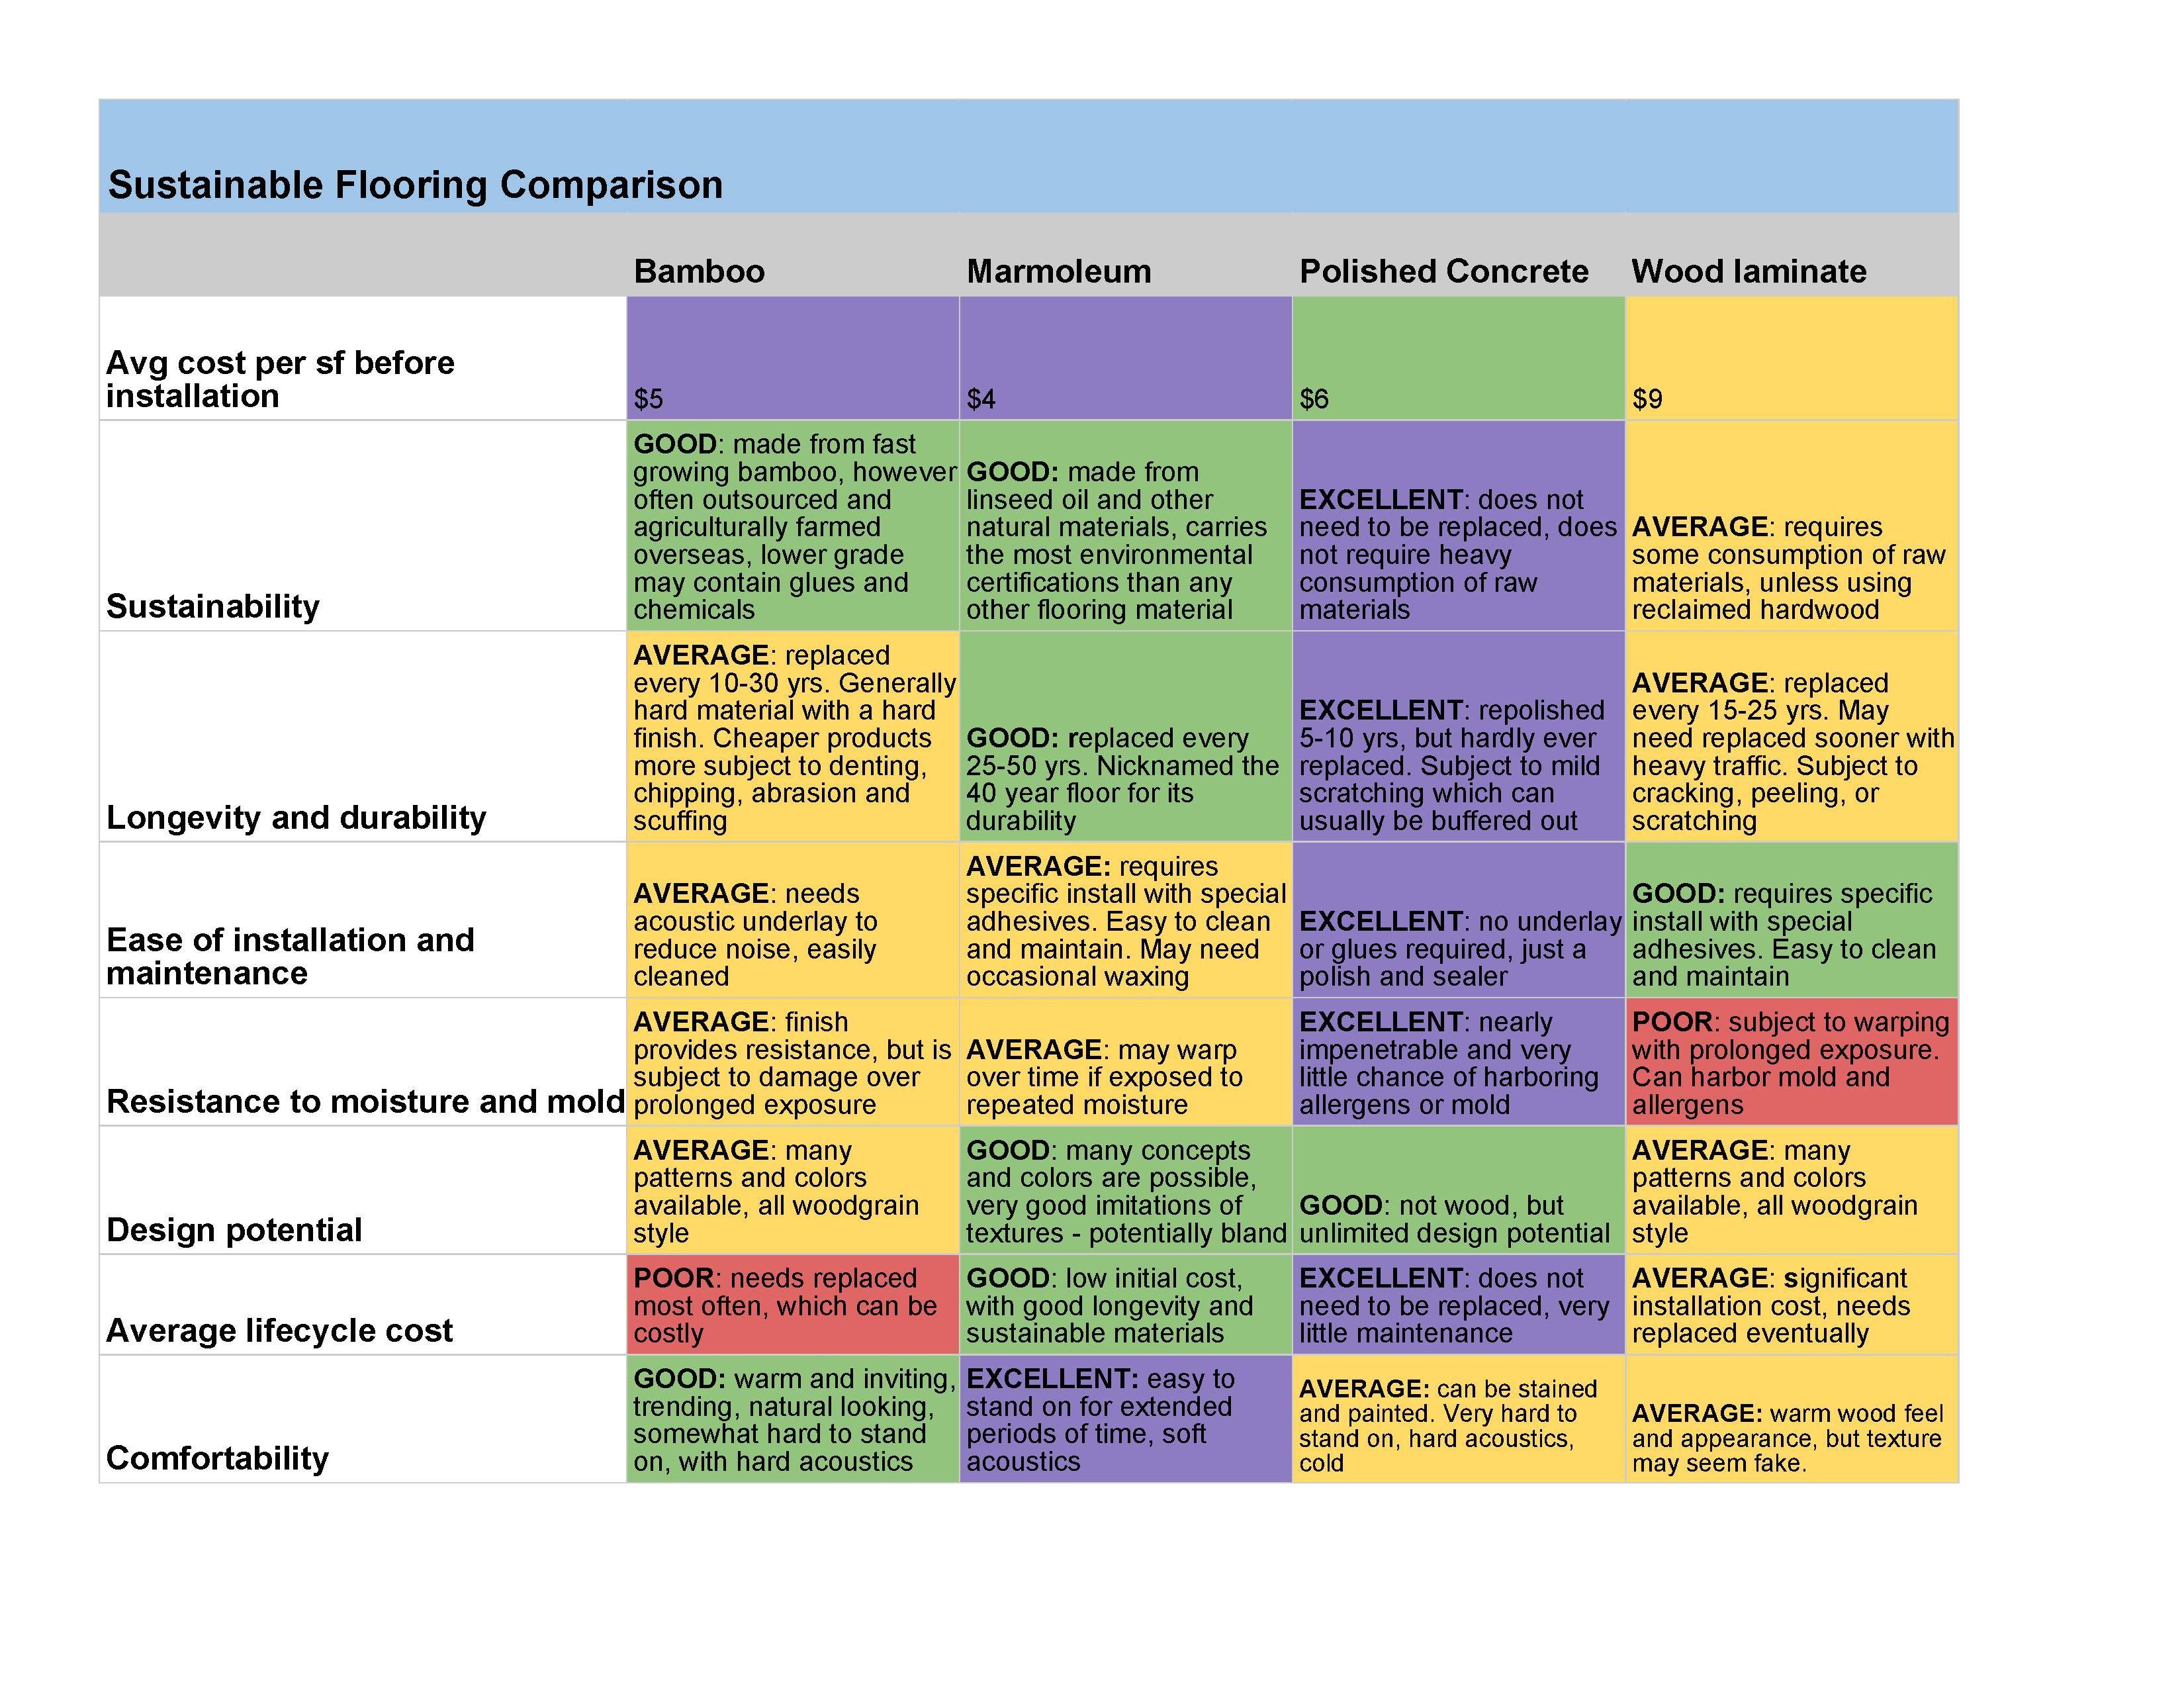 Sustainable Flooring Comparison Chart